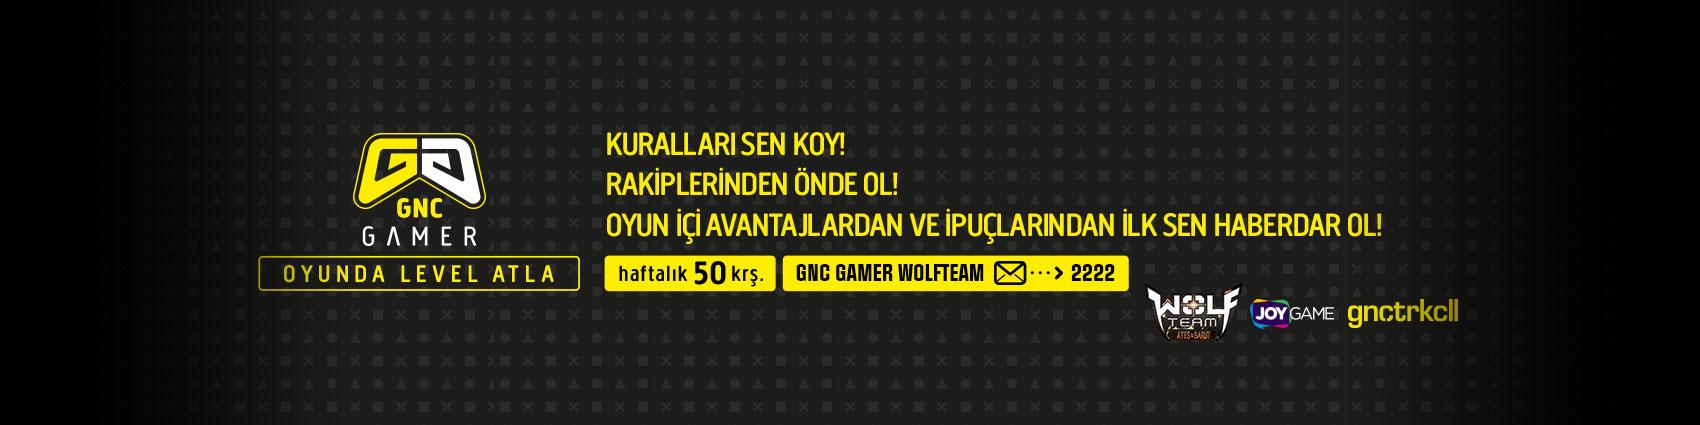 GNC Gamer Servisi